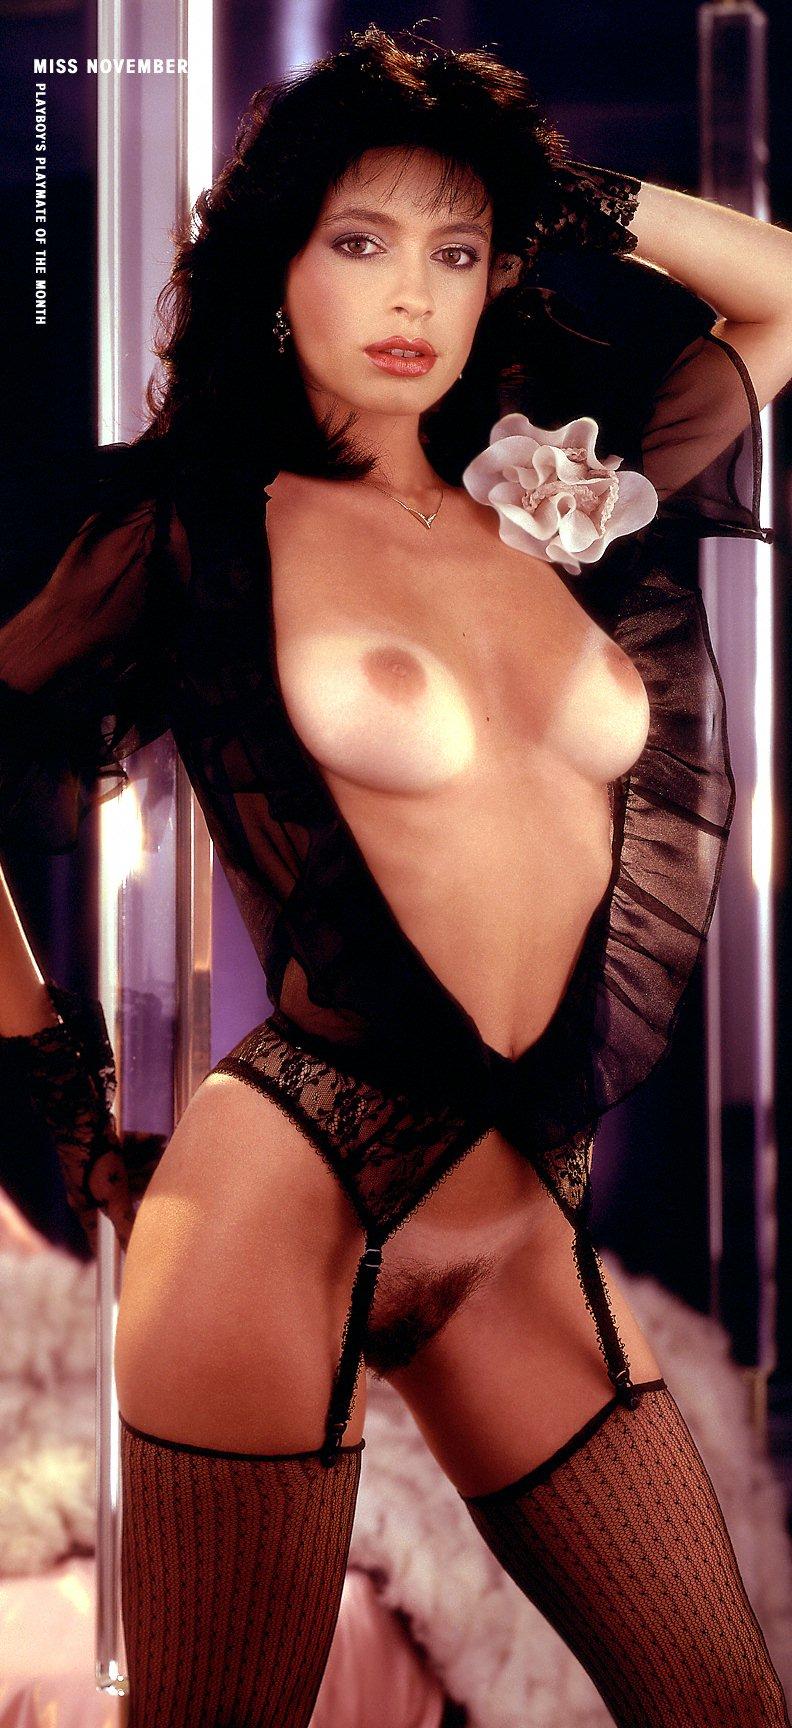 Playboy playmate veronica gamba nude